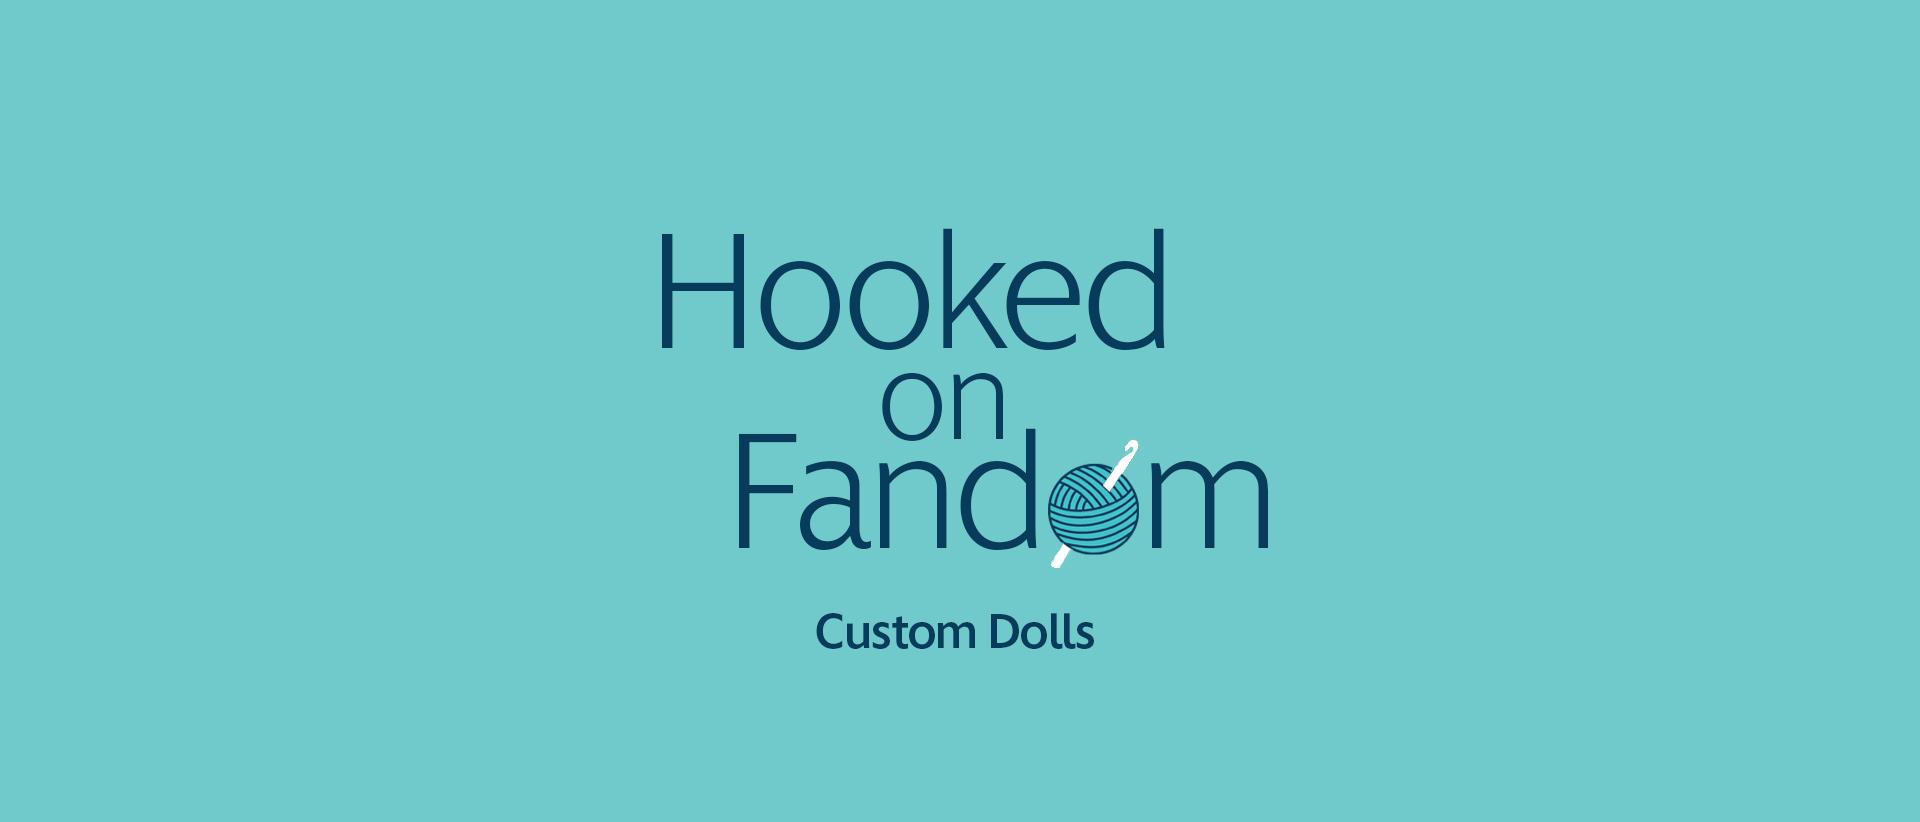 Hooked on Fandom